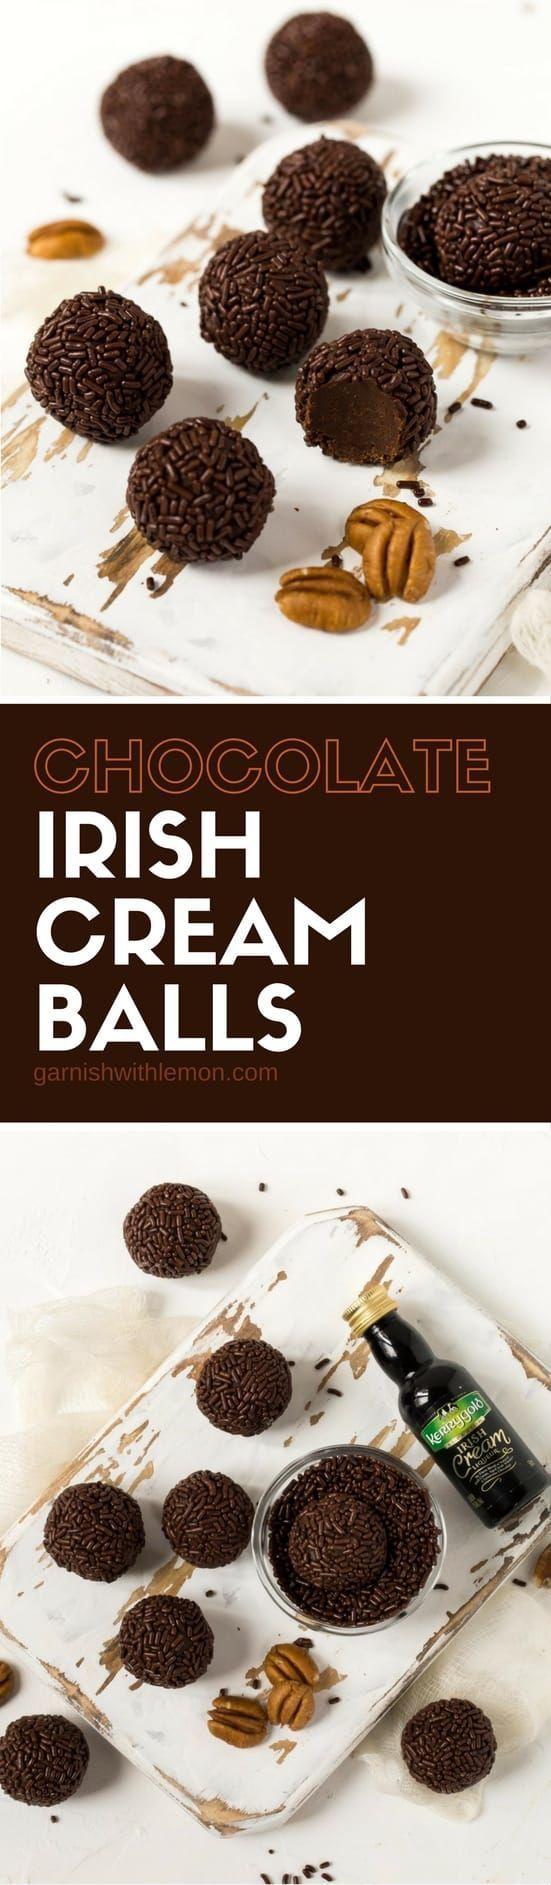 Homemade food gifts don't get much more decadent than these no-bake Dark Chocolate Irish Cream Balls.  Baileys would be my Irish Cream choice.